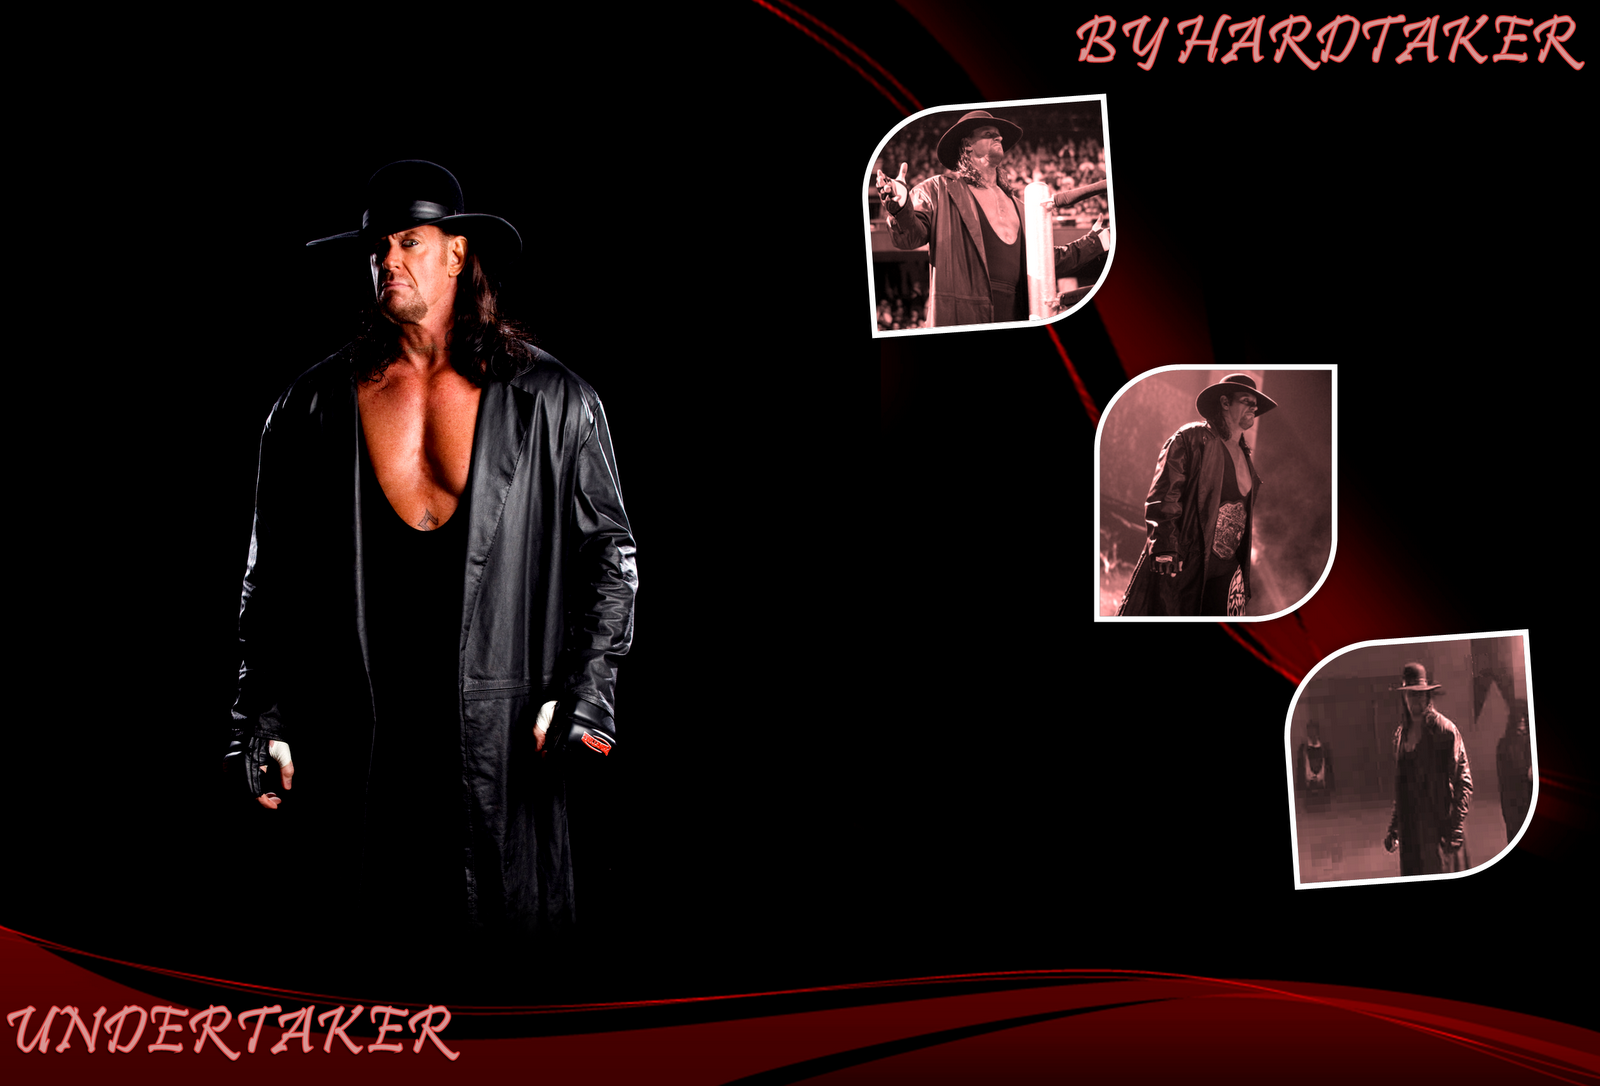 http://2.bp.blogspot.com/-iRFQ9wAmGeE/Tjc2APfg4JI/AAAAAAAAAbM/b3B4Dkp8GIQ/s1600/red_undertaker_wallpaper_by_hardtaker-d31zjqc.png